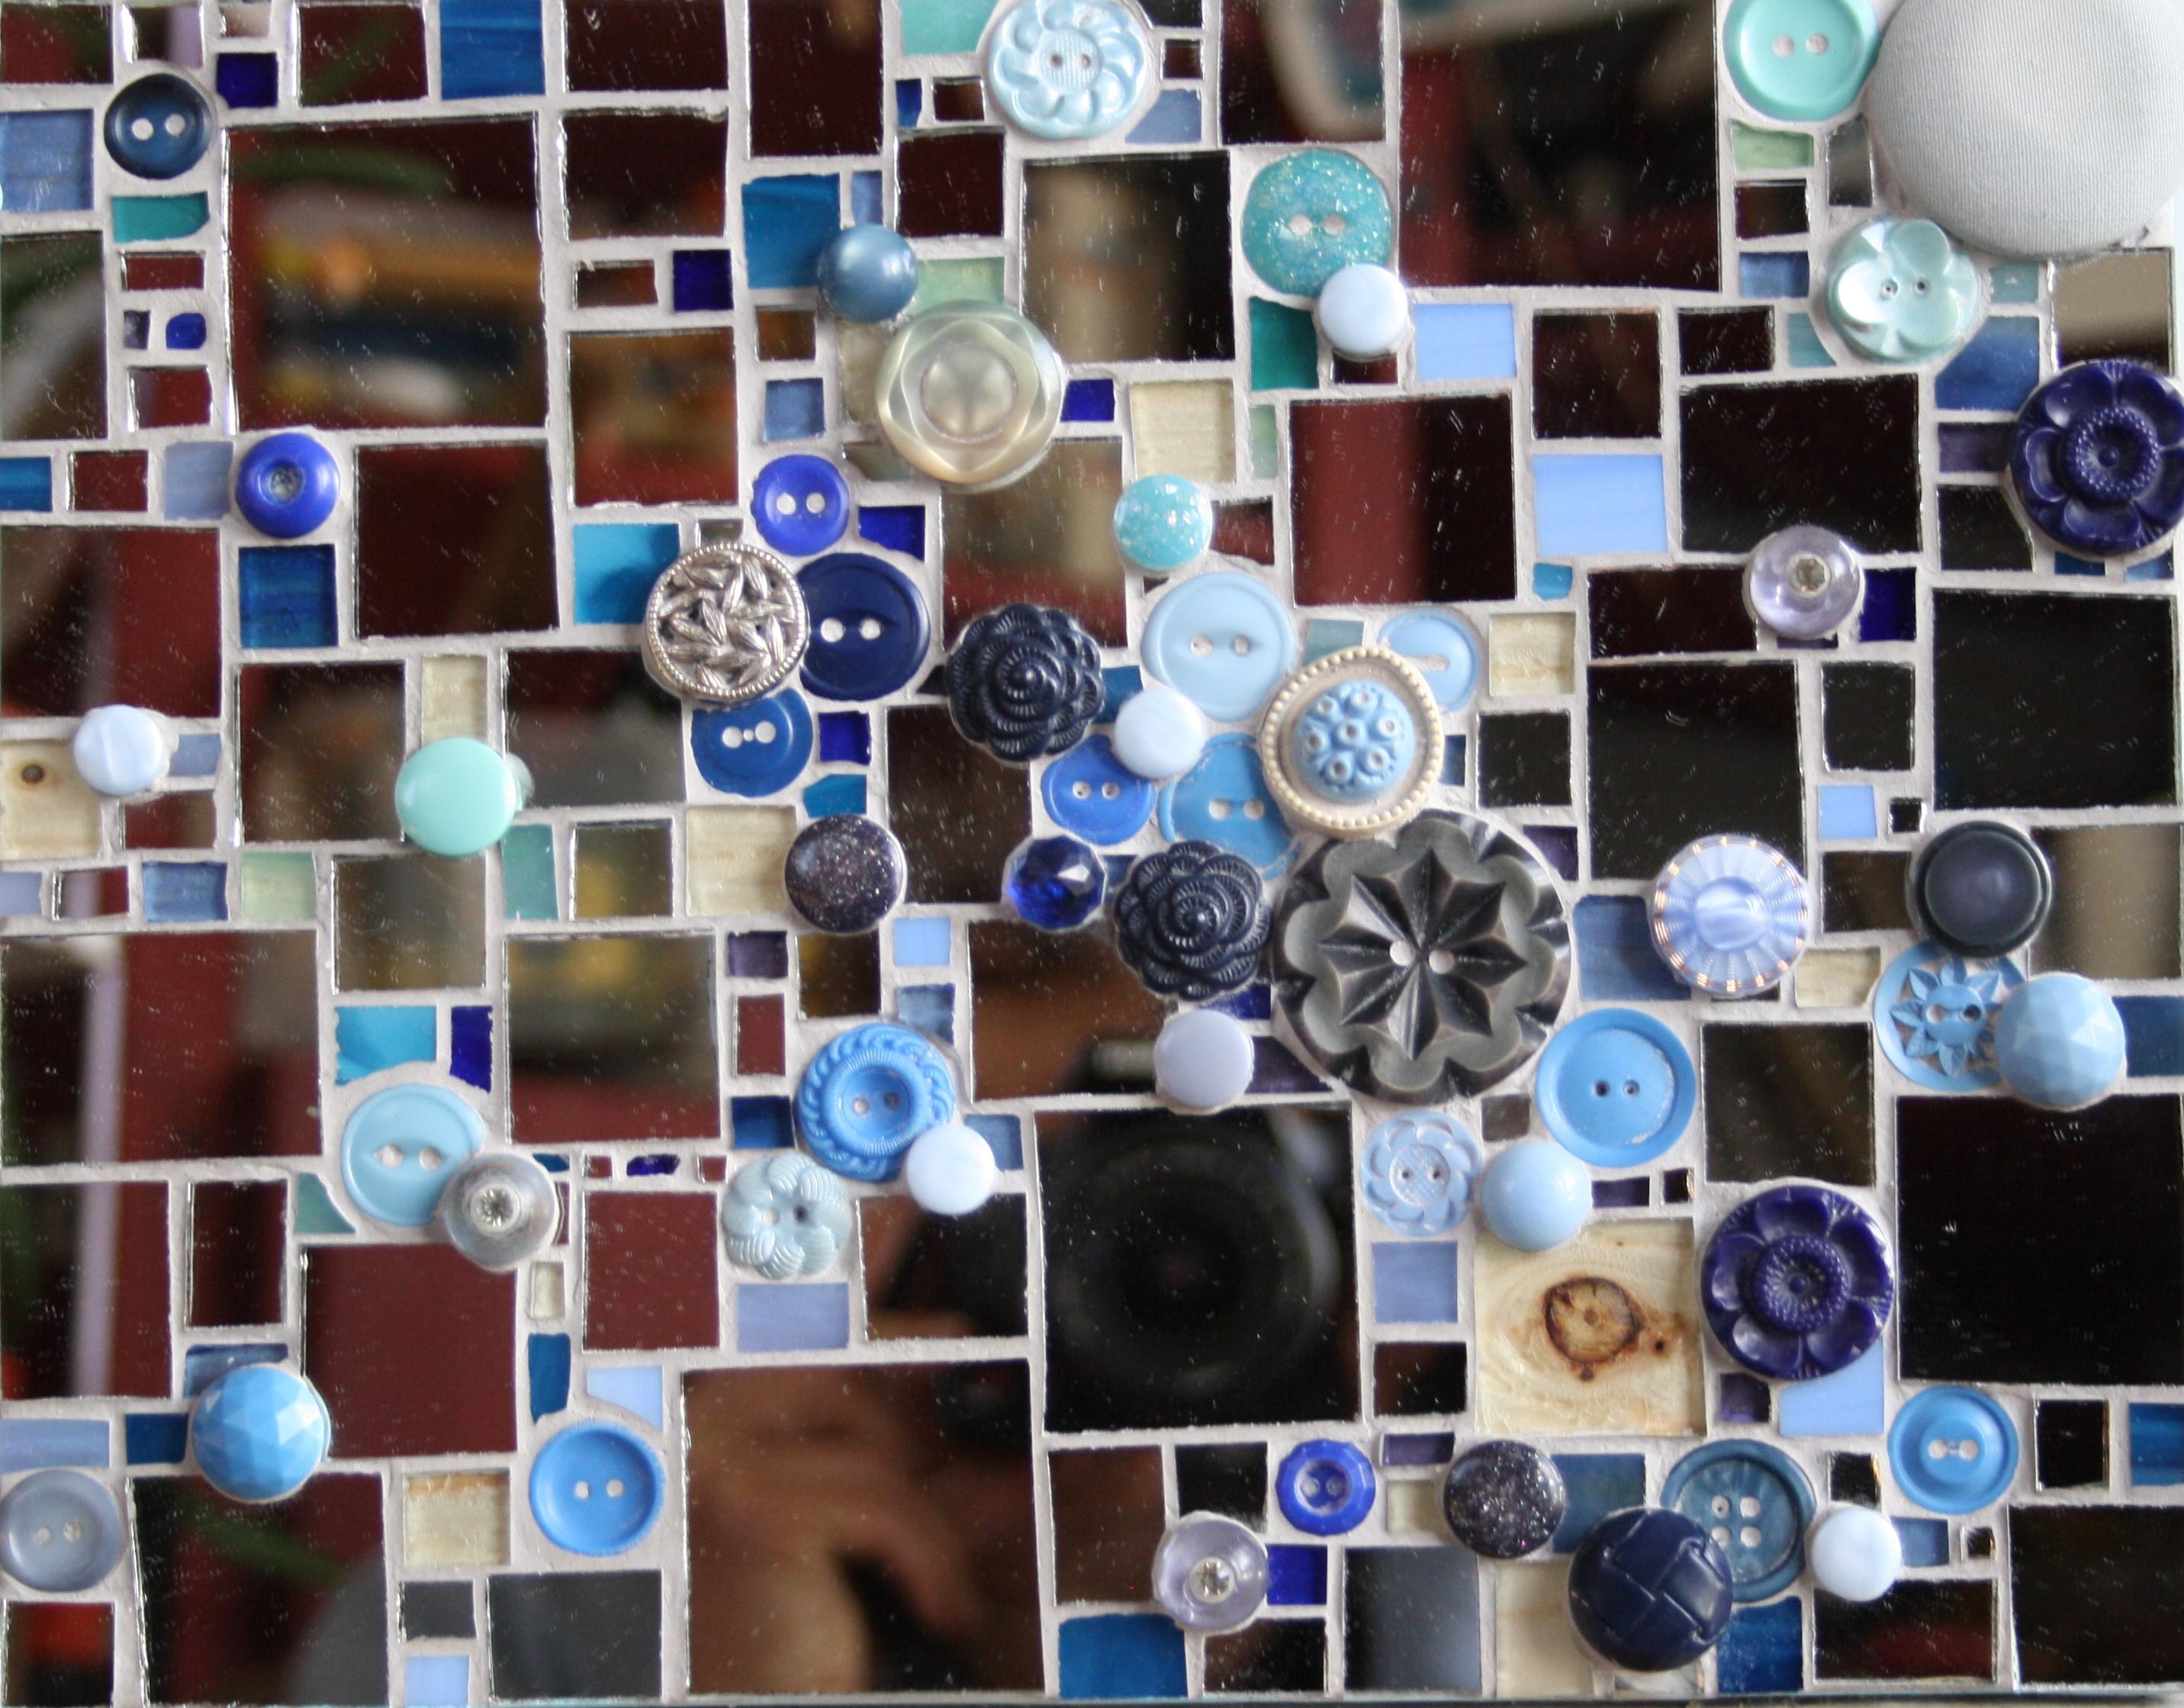 Miroir et boutons bleus